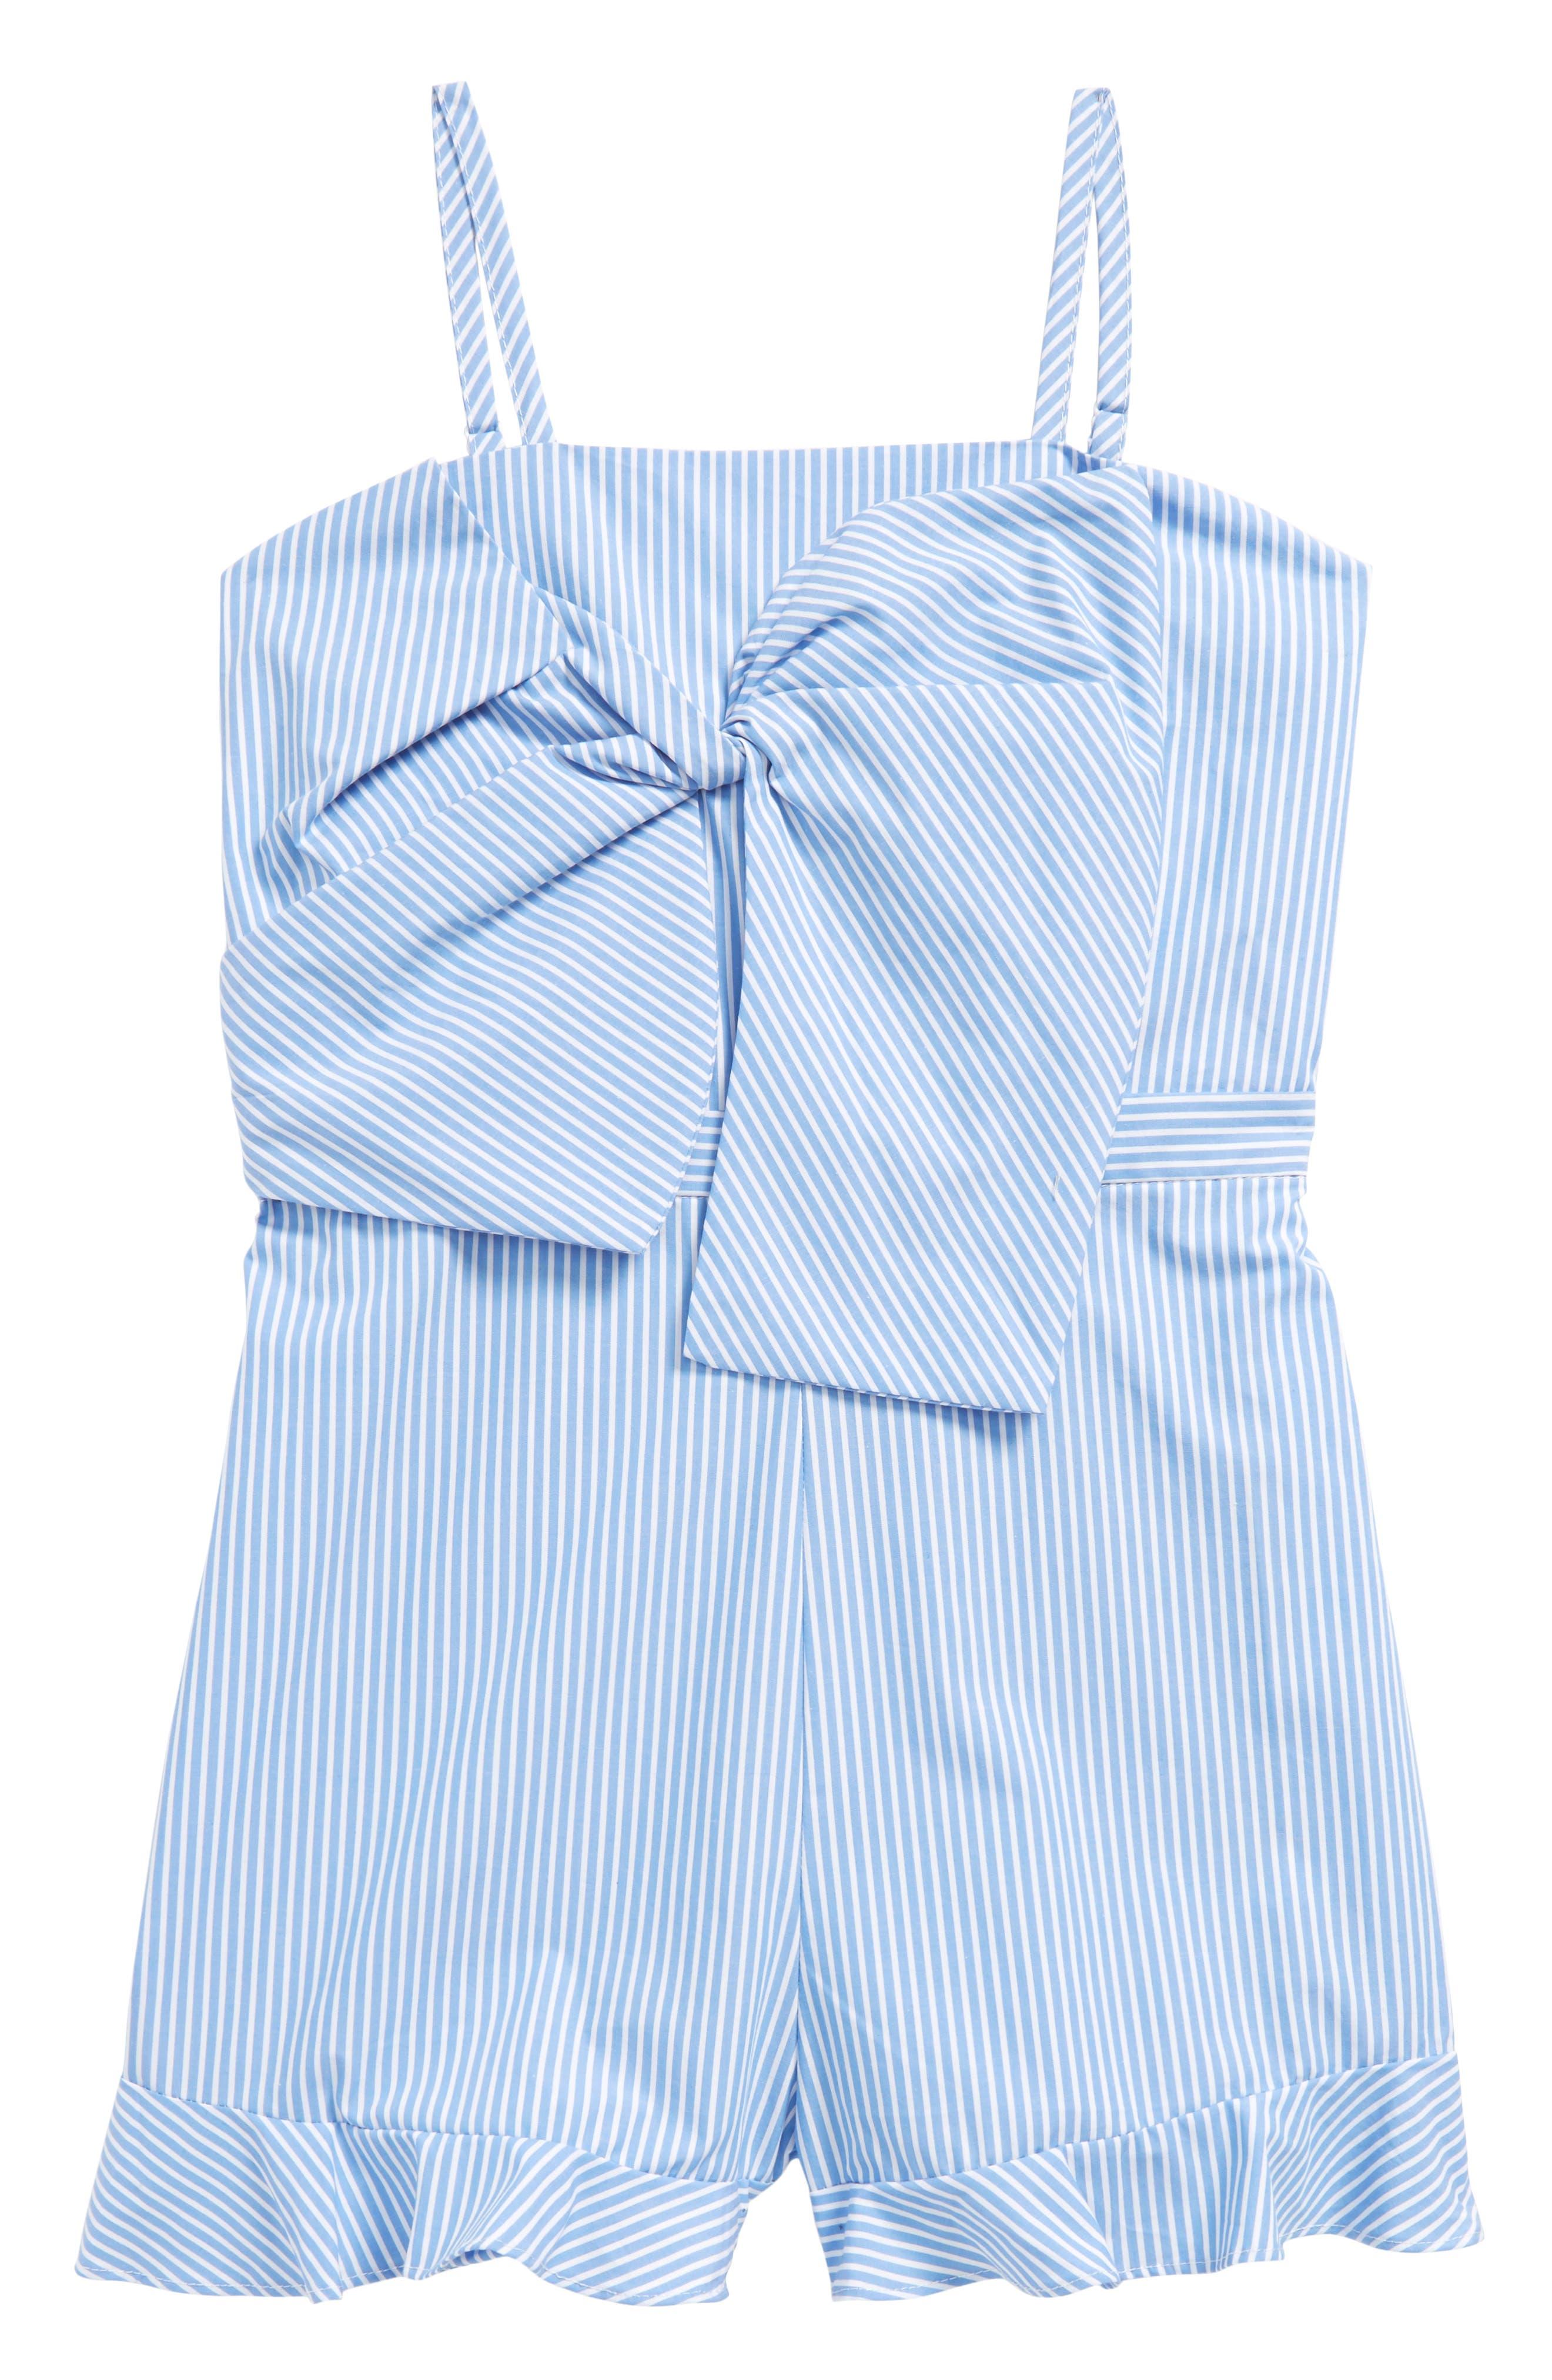 Junior Jen Stripe Bow Romper,                             Main thumbnail 1, color,                             Placid Blue Stripe